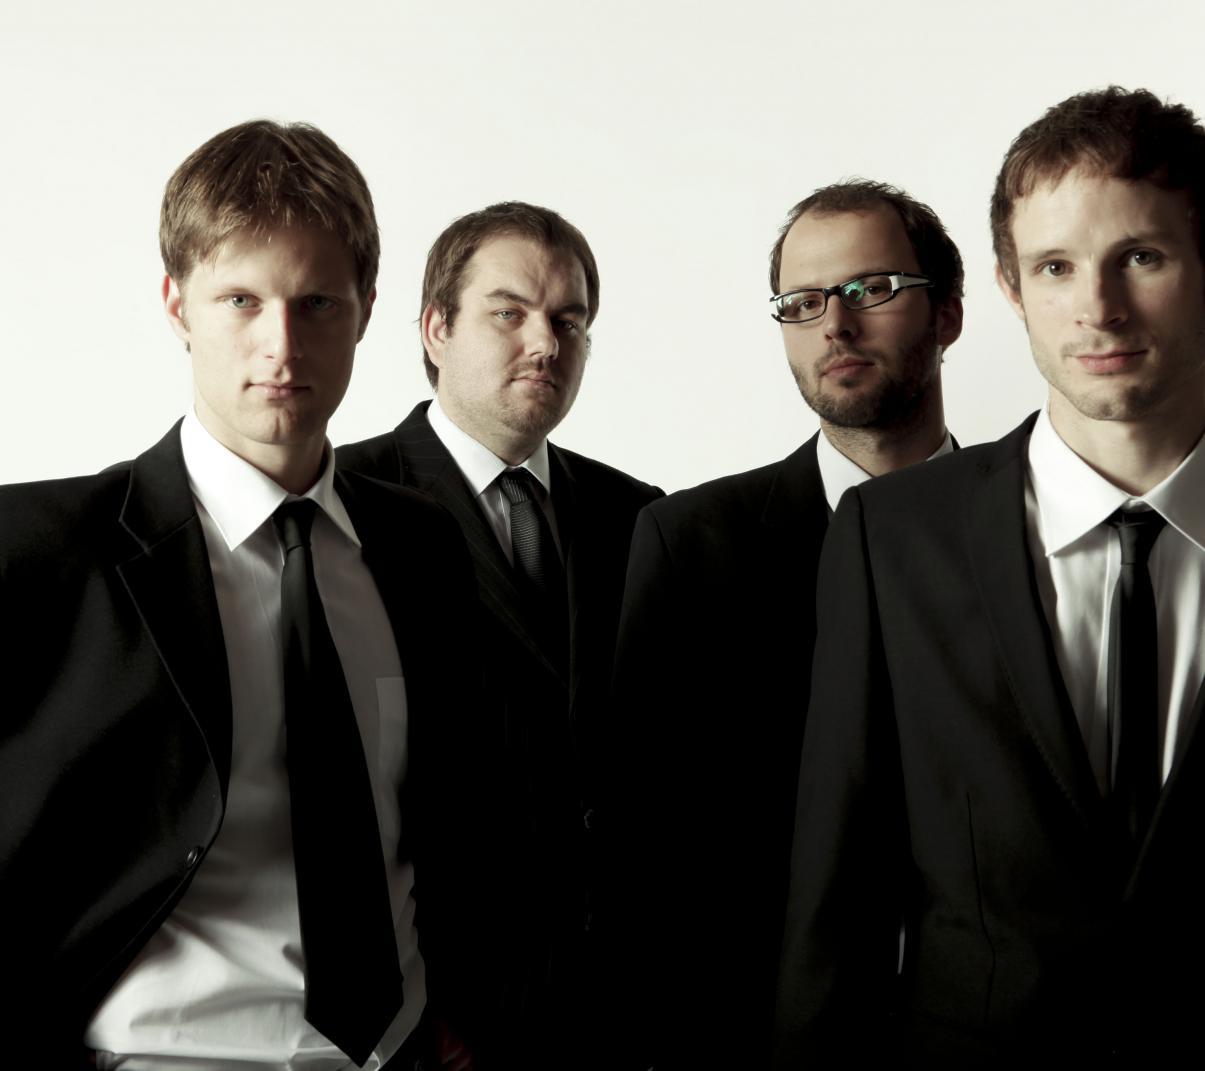 Luboš Soukup, Miroslav Hloucal, Tomáš Liška, Tomáš Hobzek (foto Adam Holý)